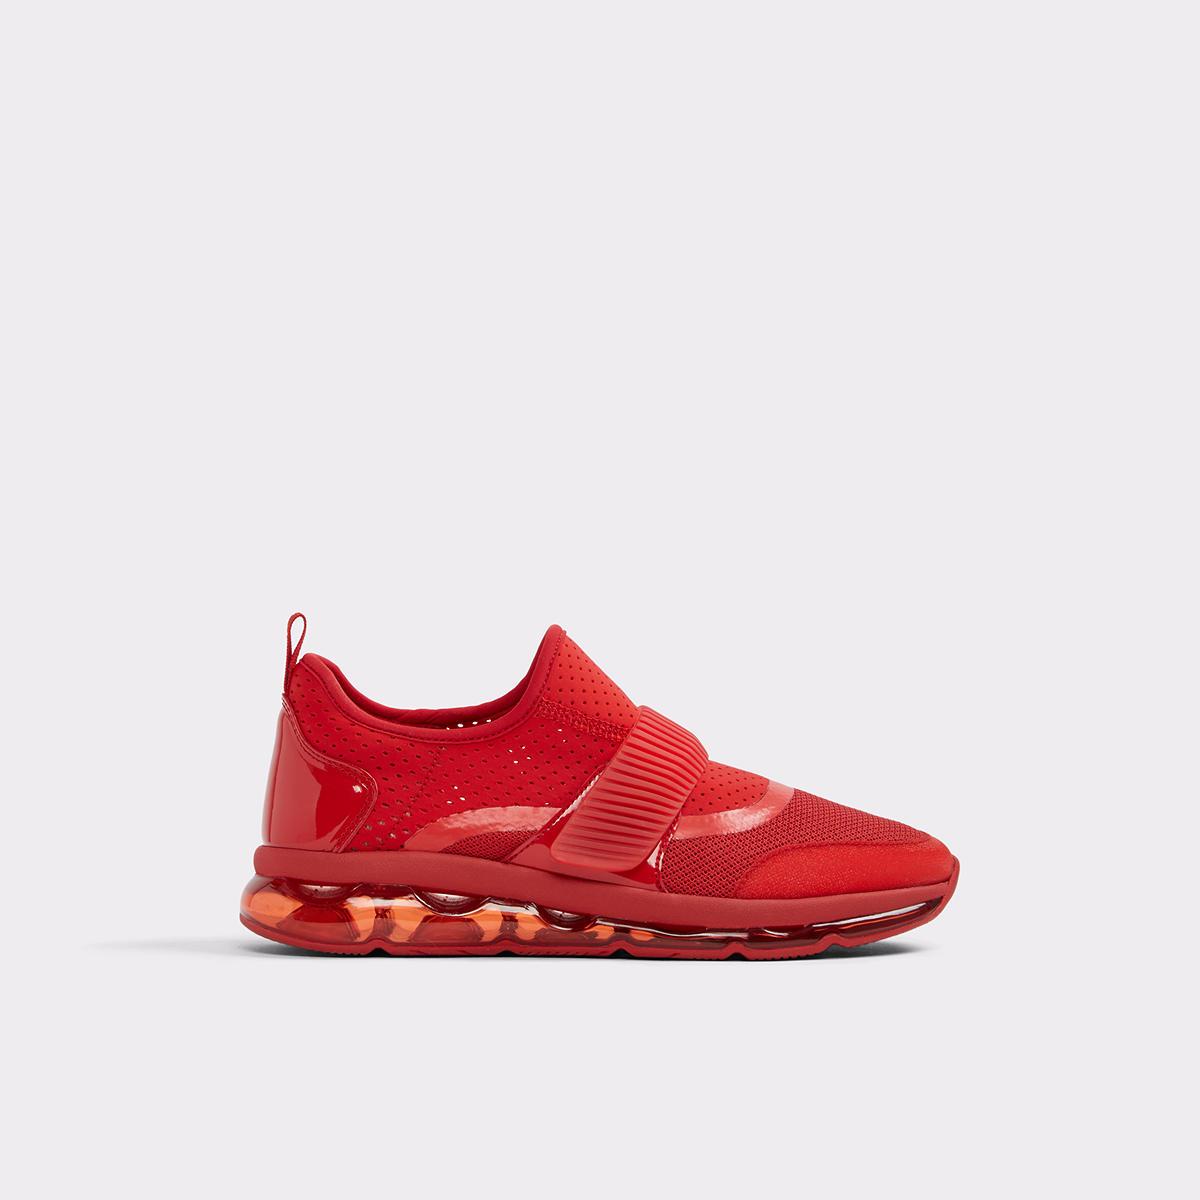 aldo shoes twitter header photo size